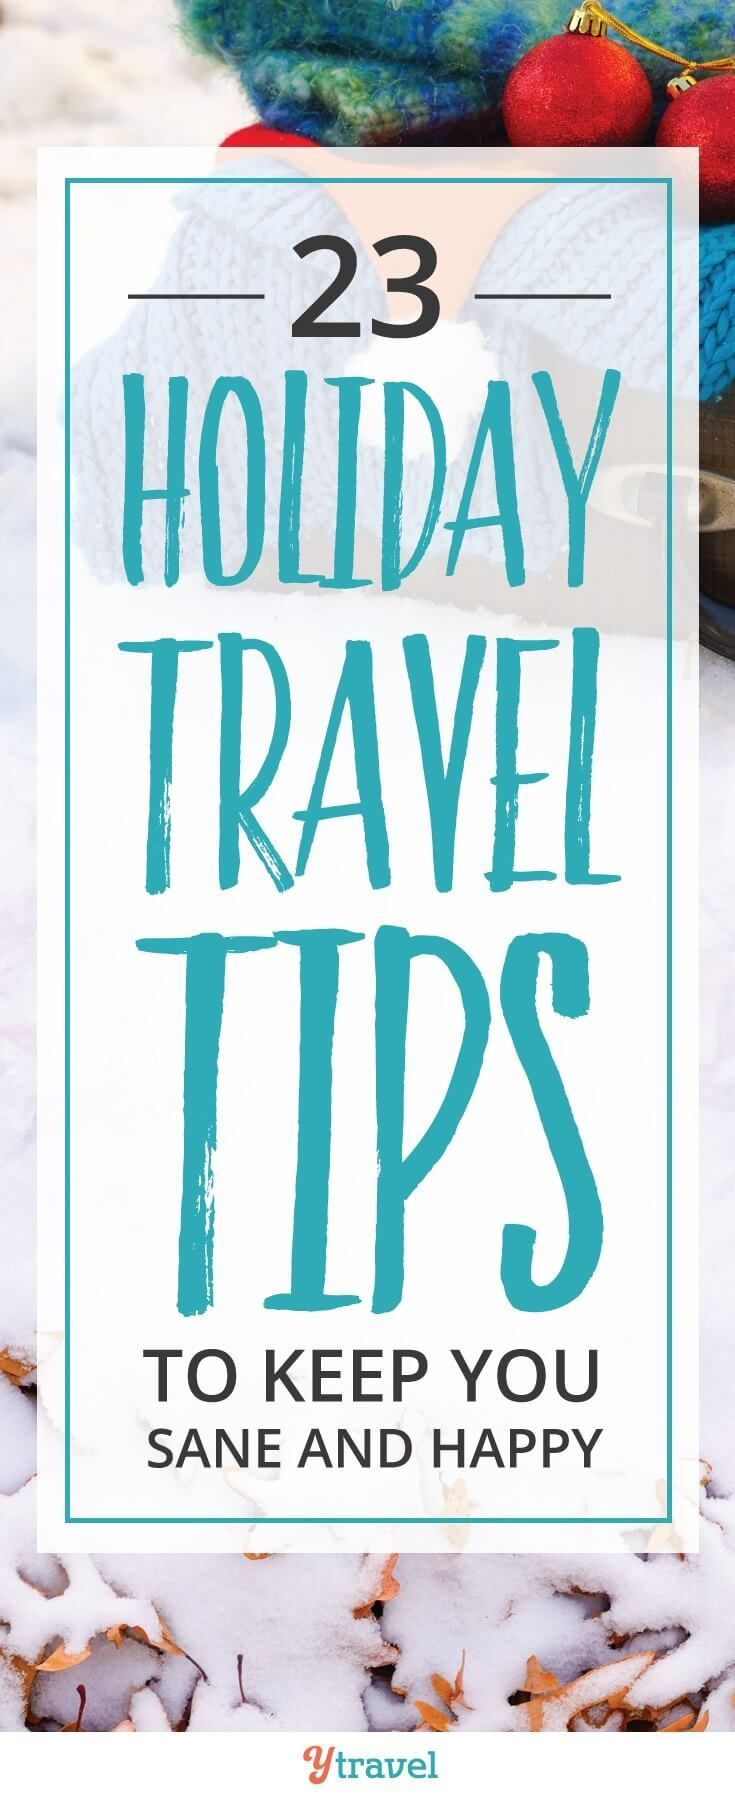 Vacation Travel Tips for This HolidaySeason